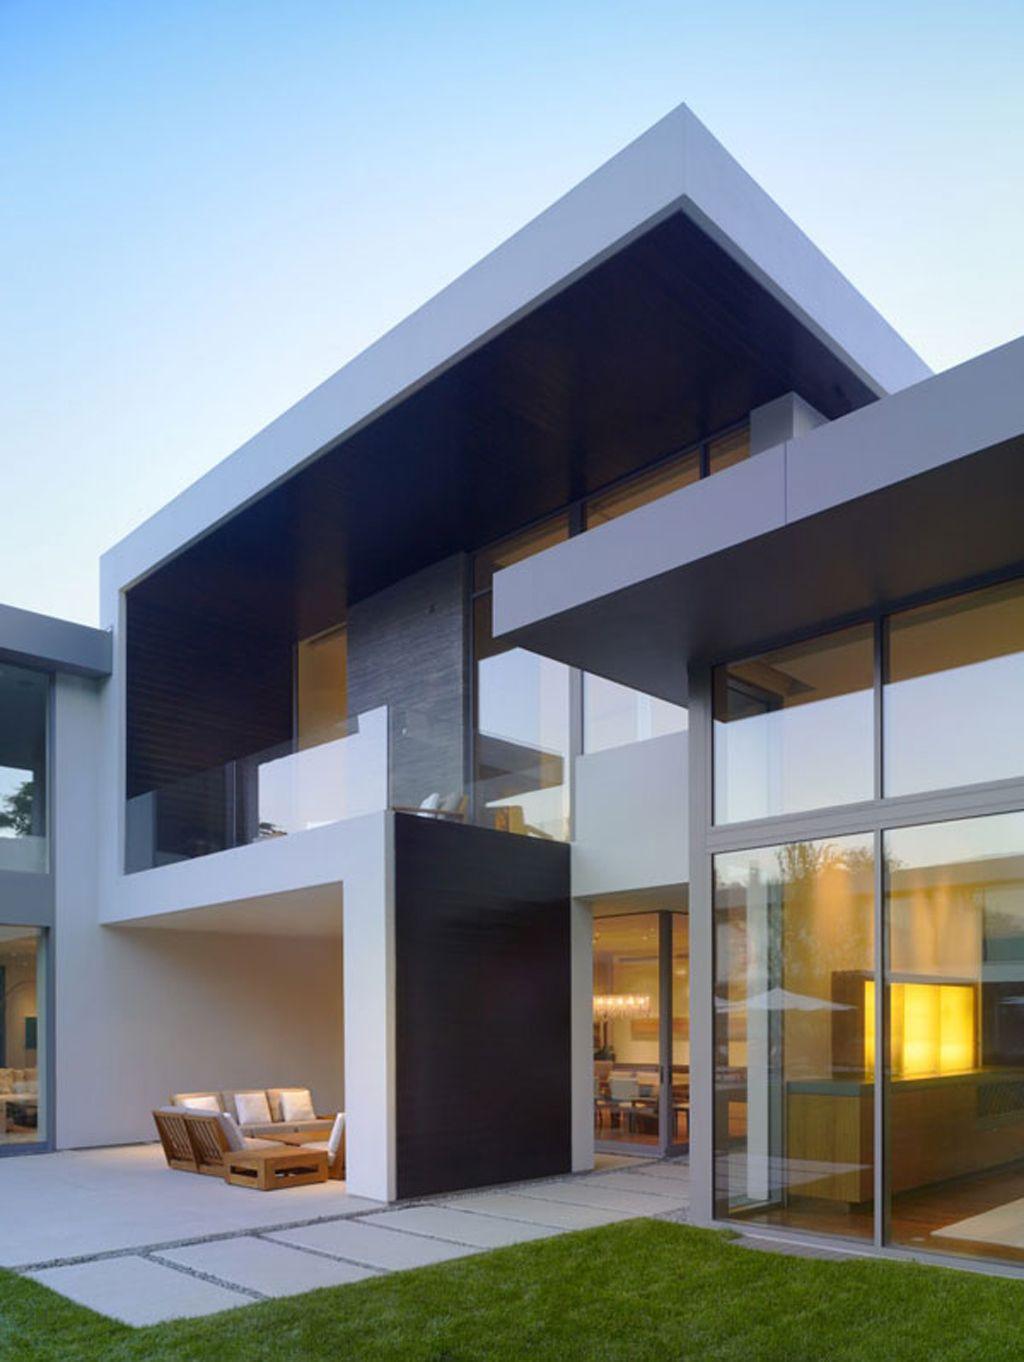 Urban House Plans Urban House Plans Architecture Interior Design